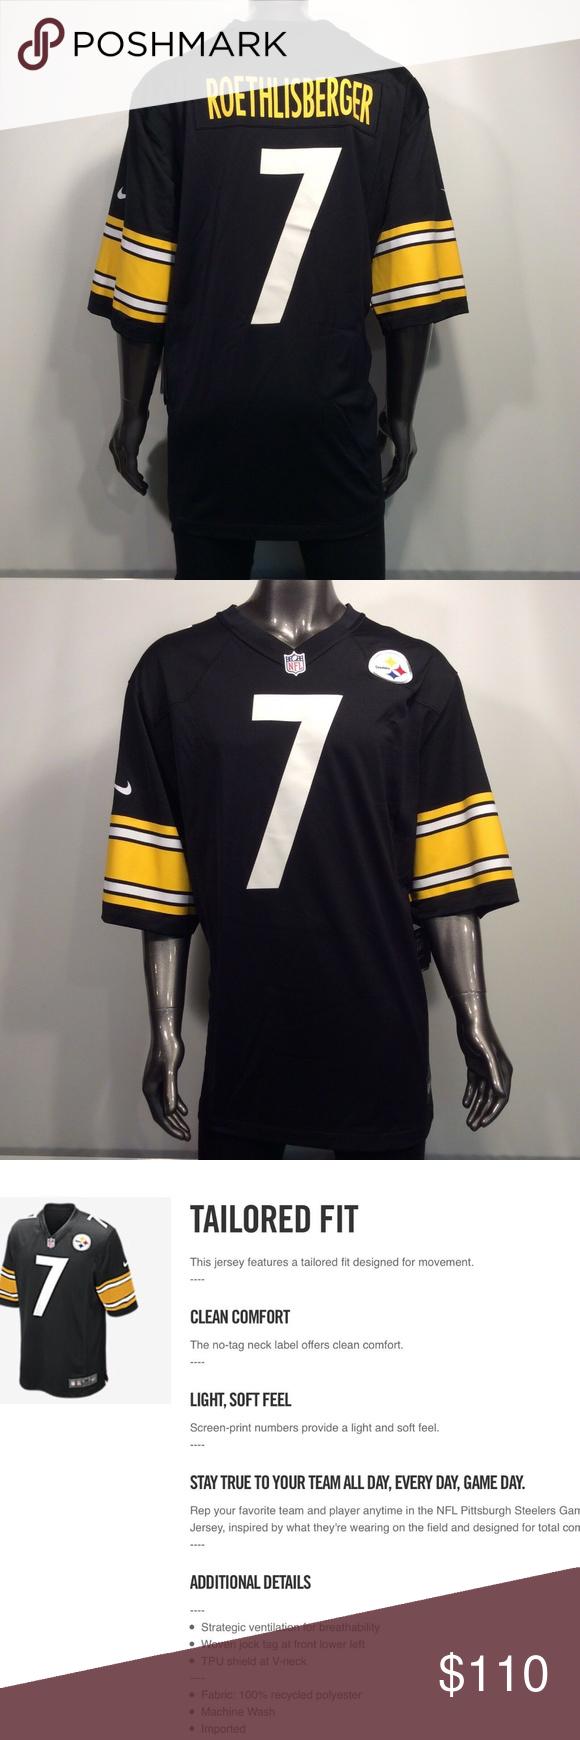 Pittsburgh Steelers Ben Roethlisberger 3xl Jersey Pittsburgh Steelers Nfl Nike Ben Roethlisberger 7 3xl Game Jersey Measurements Nike Shirts 3xl Shirts Jersey